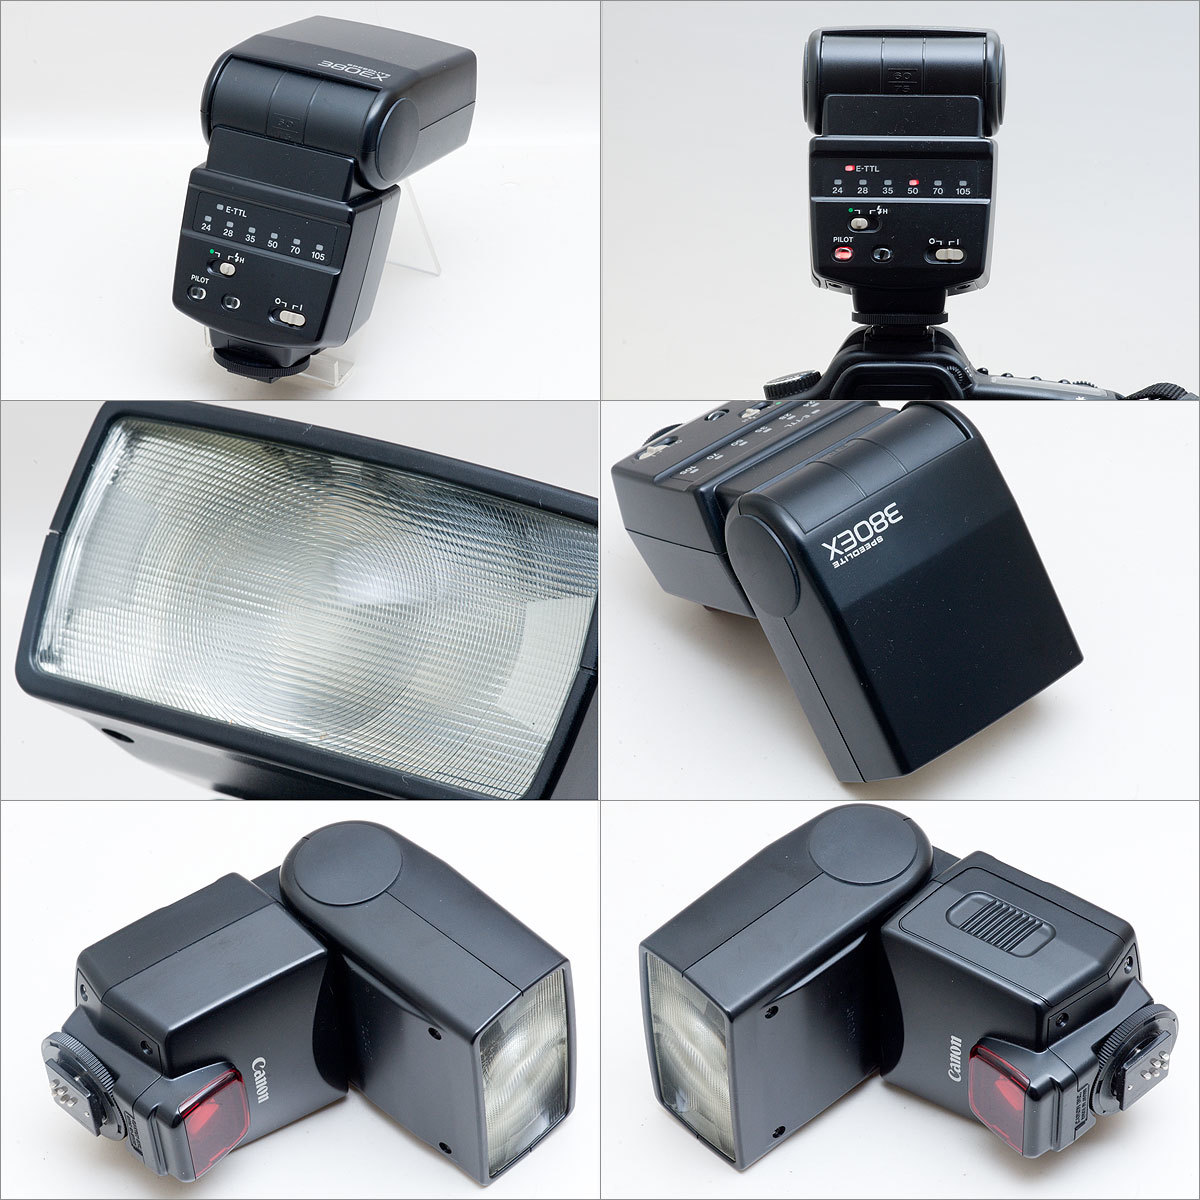 Canon SPEEDLITE 380EX デジタル・フィルム対応 動作OK (管理番号0803)_画像2